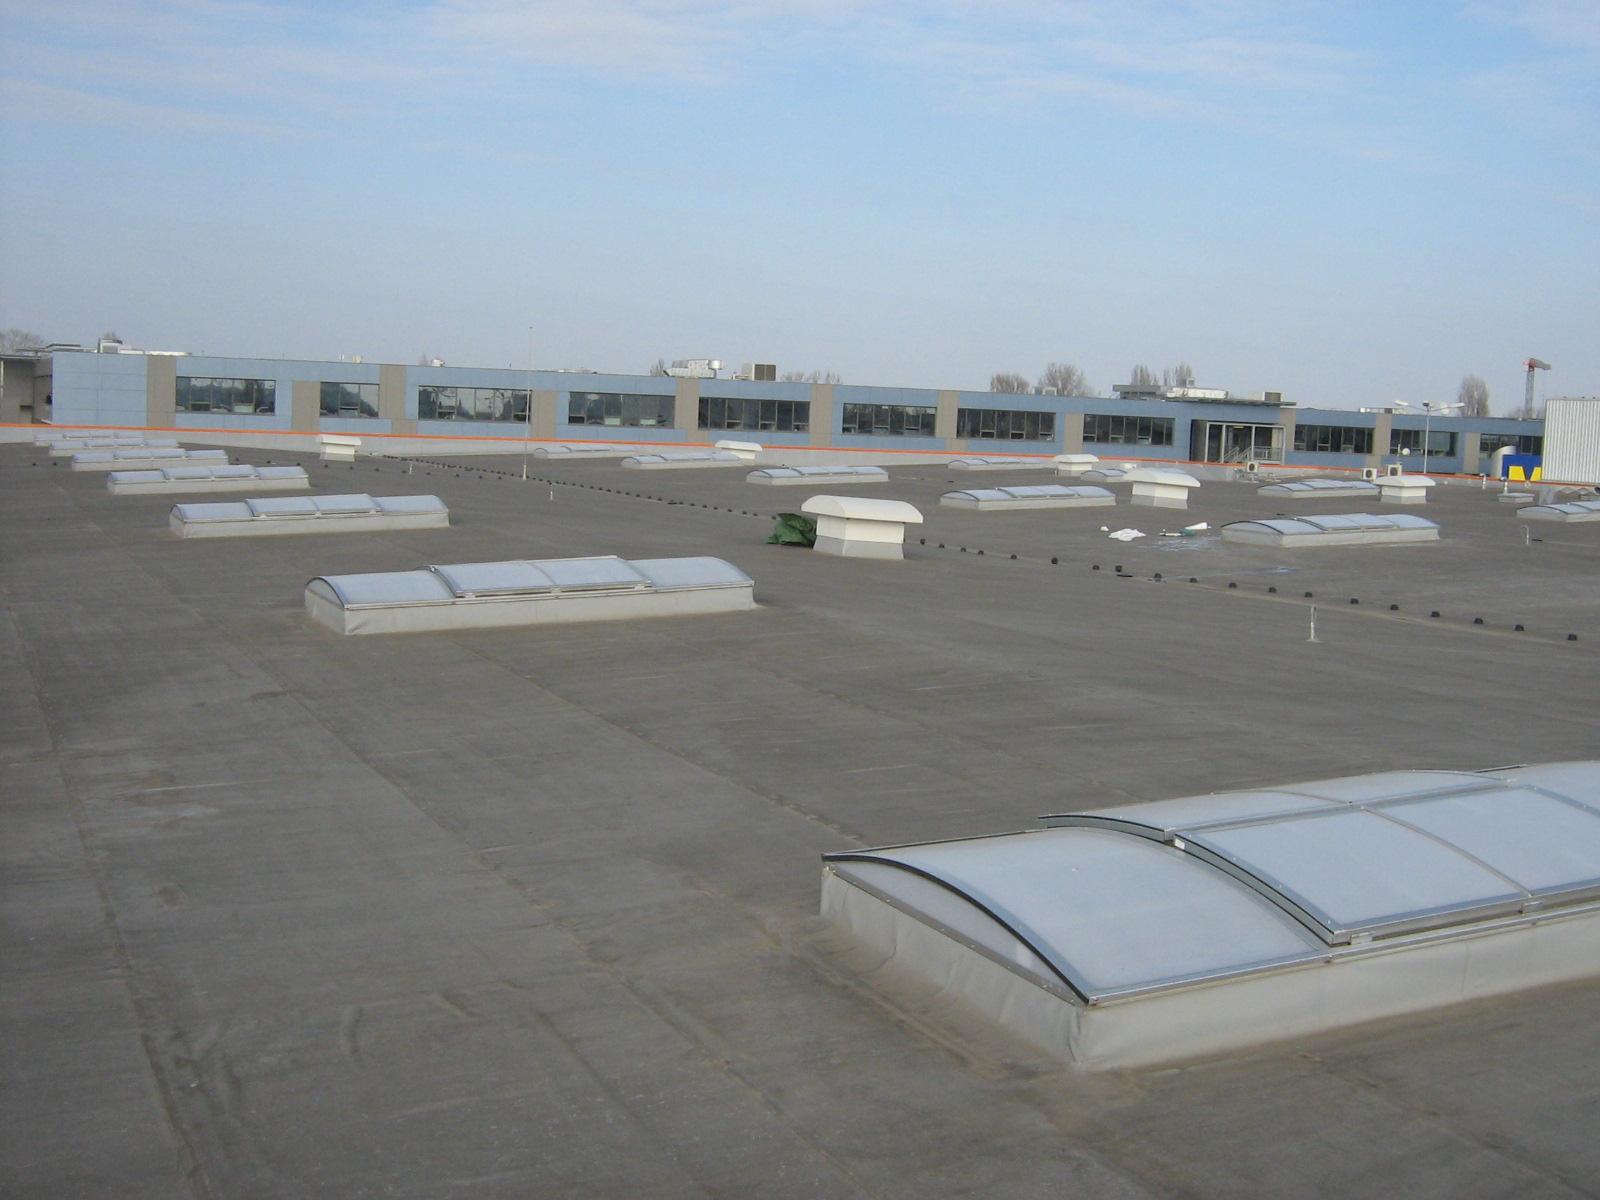 Luminatoare industriale - Spatiu comercial OBI - Policolor HEXADOME - Poza 1